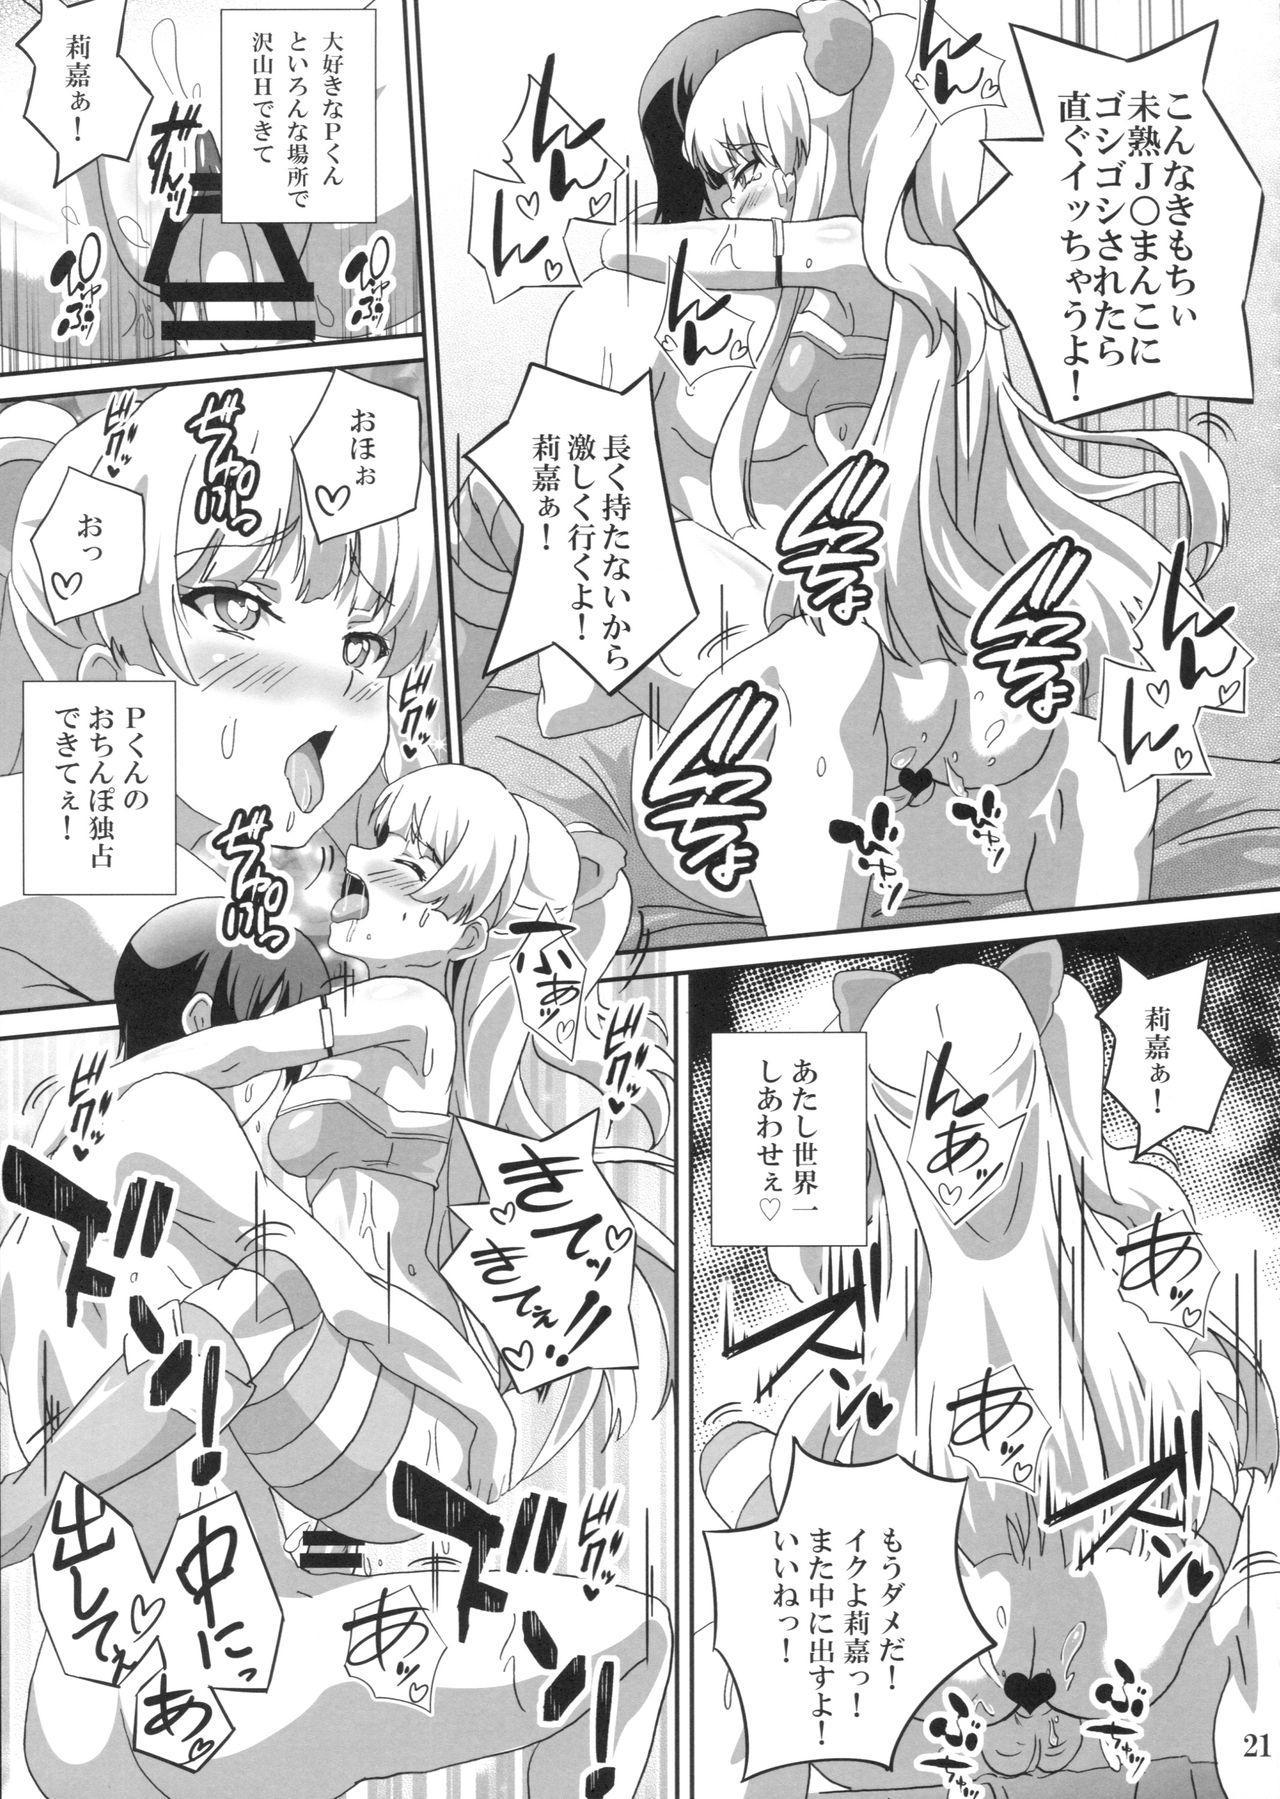 P-kun!  Yarisugi! 2 19